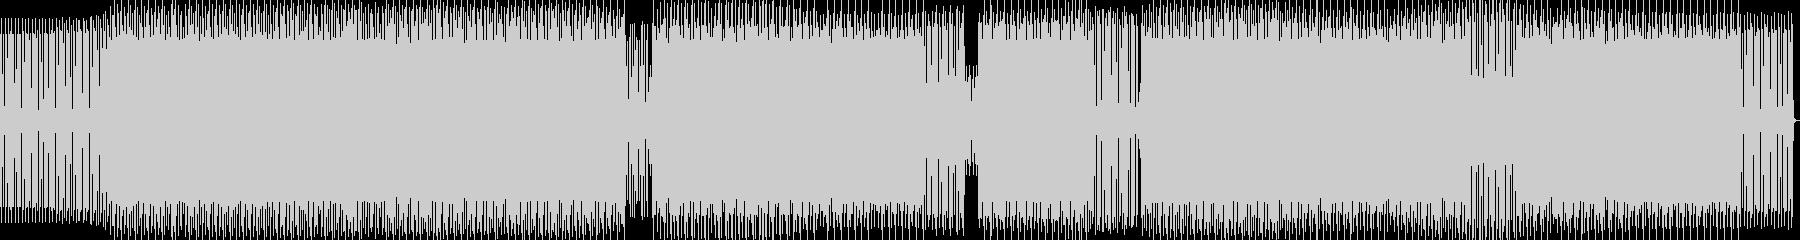 tech house 02 の未再生の波形